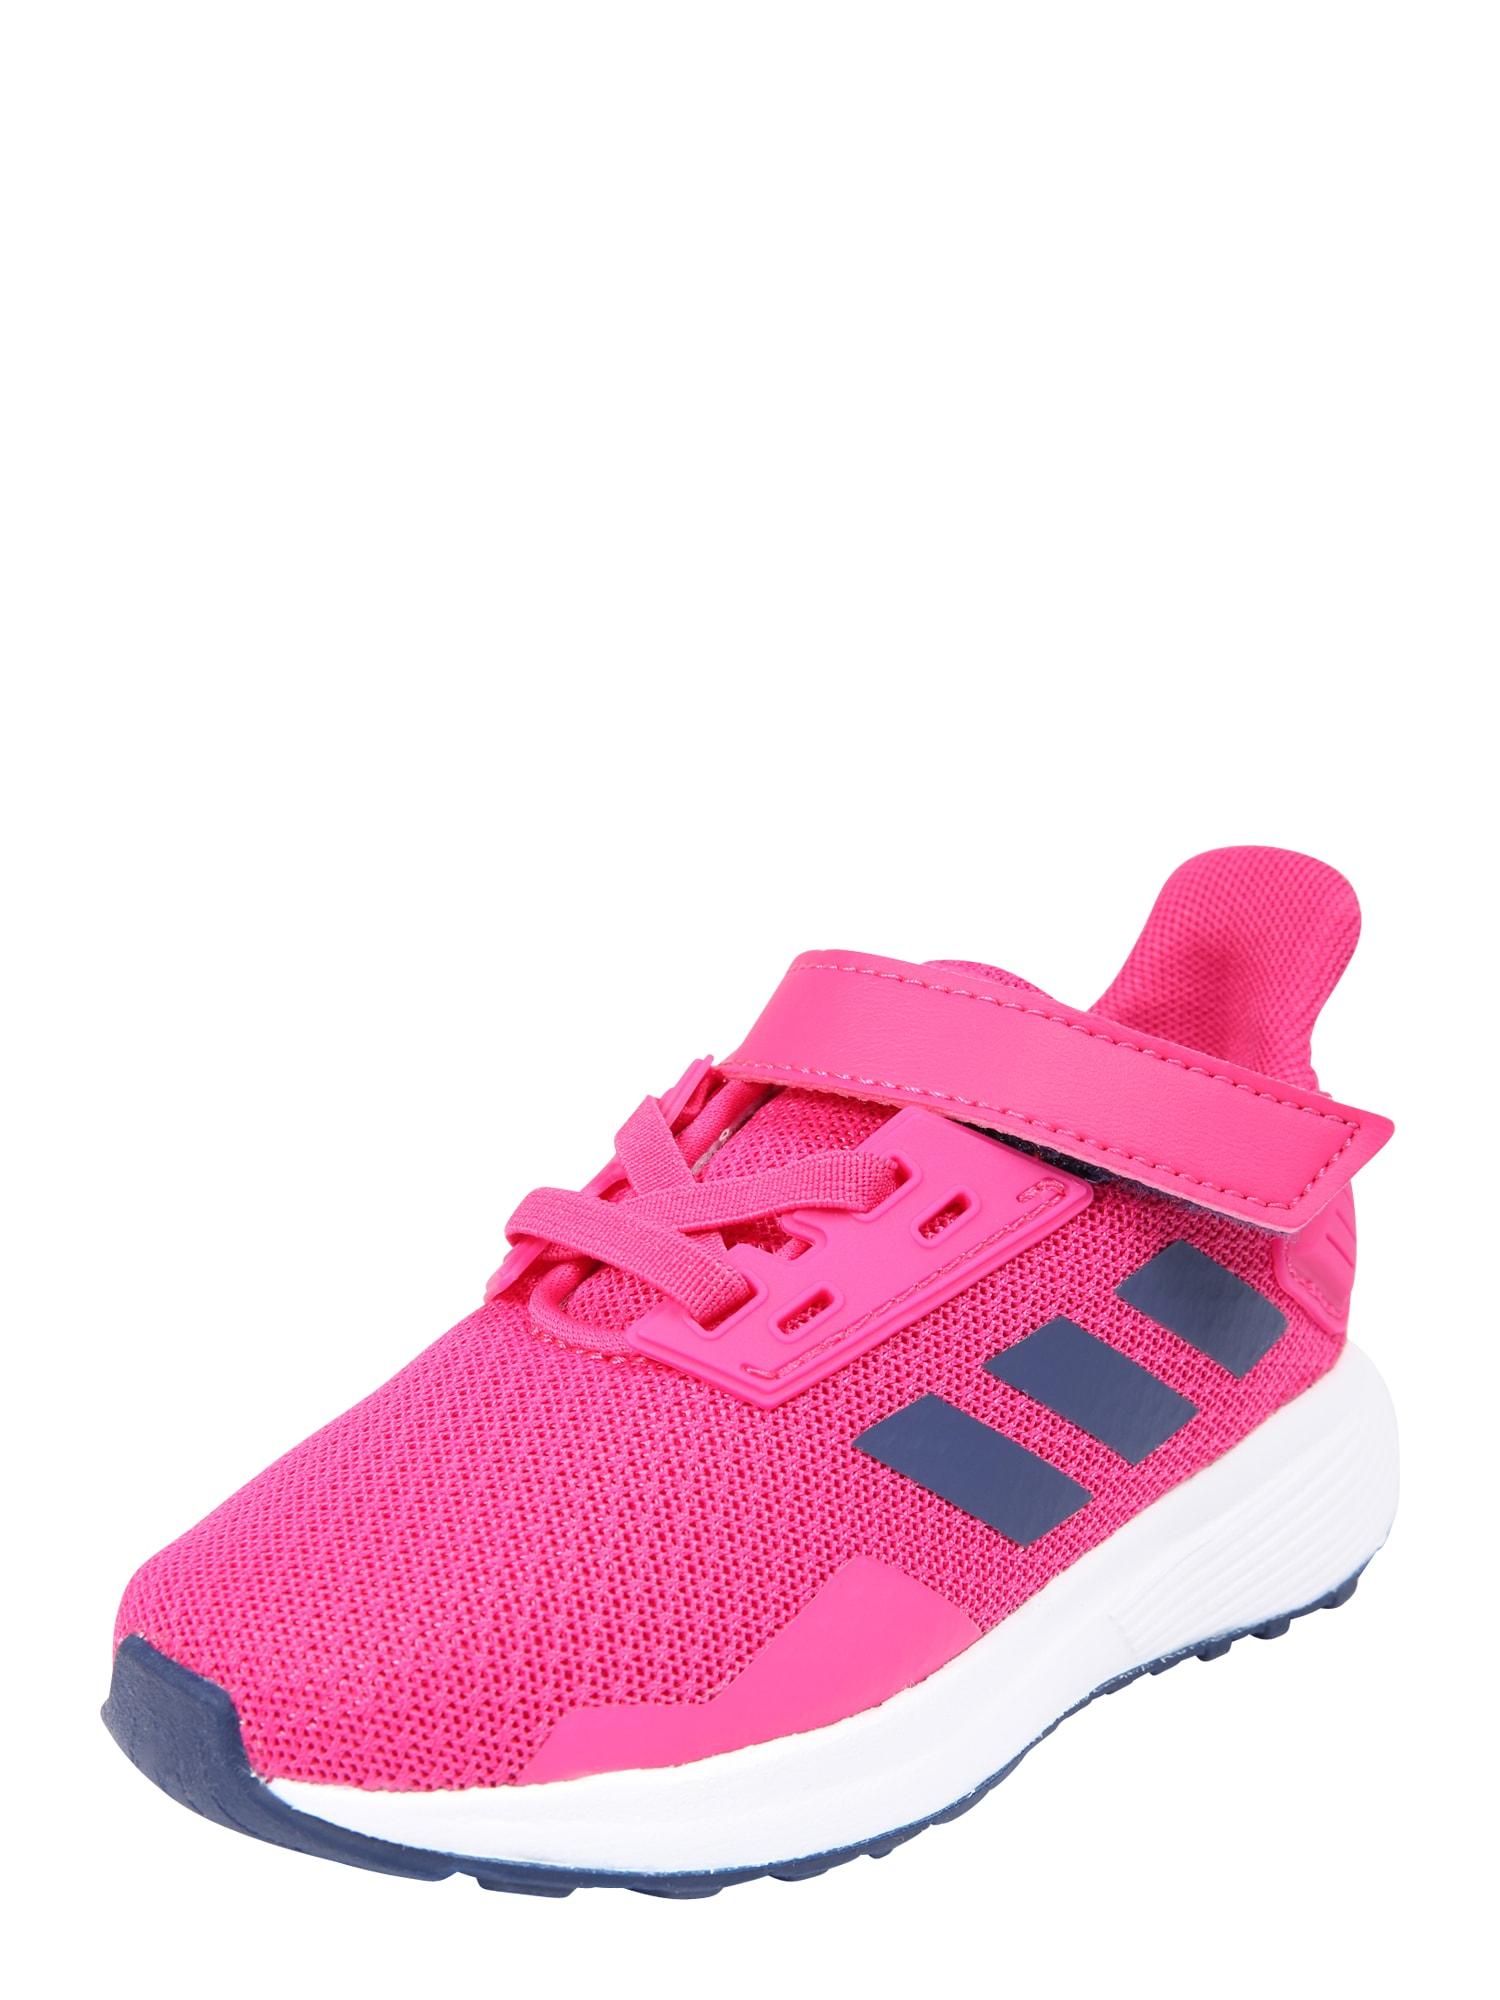 Sportovní boty DURAMO 9 I pink ADIDAS PERFORMANCE